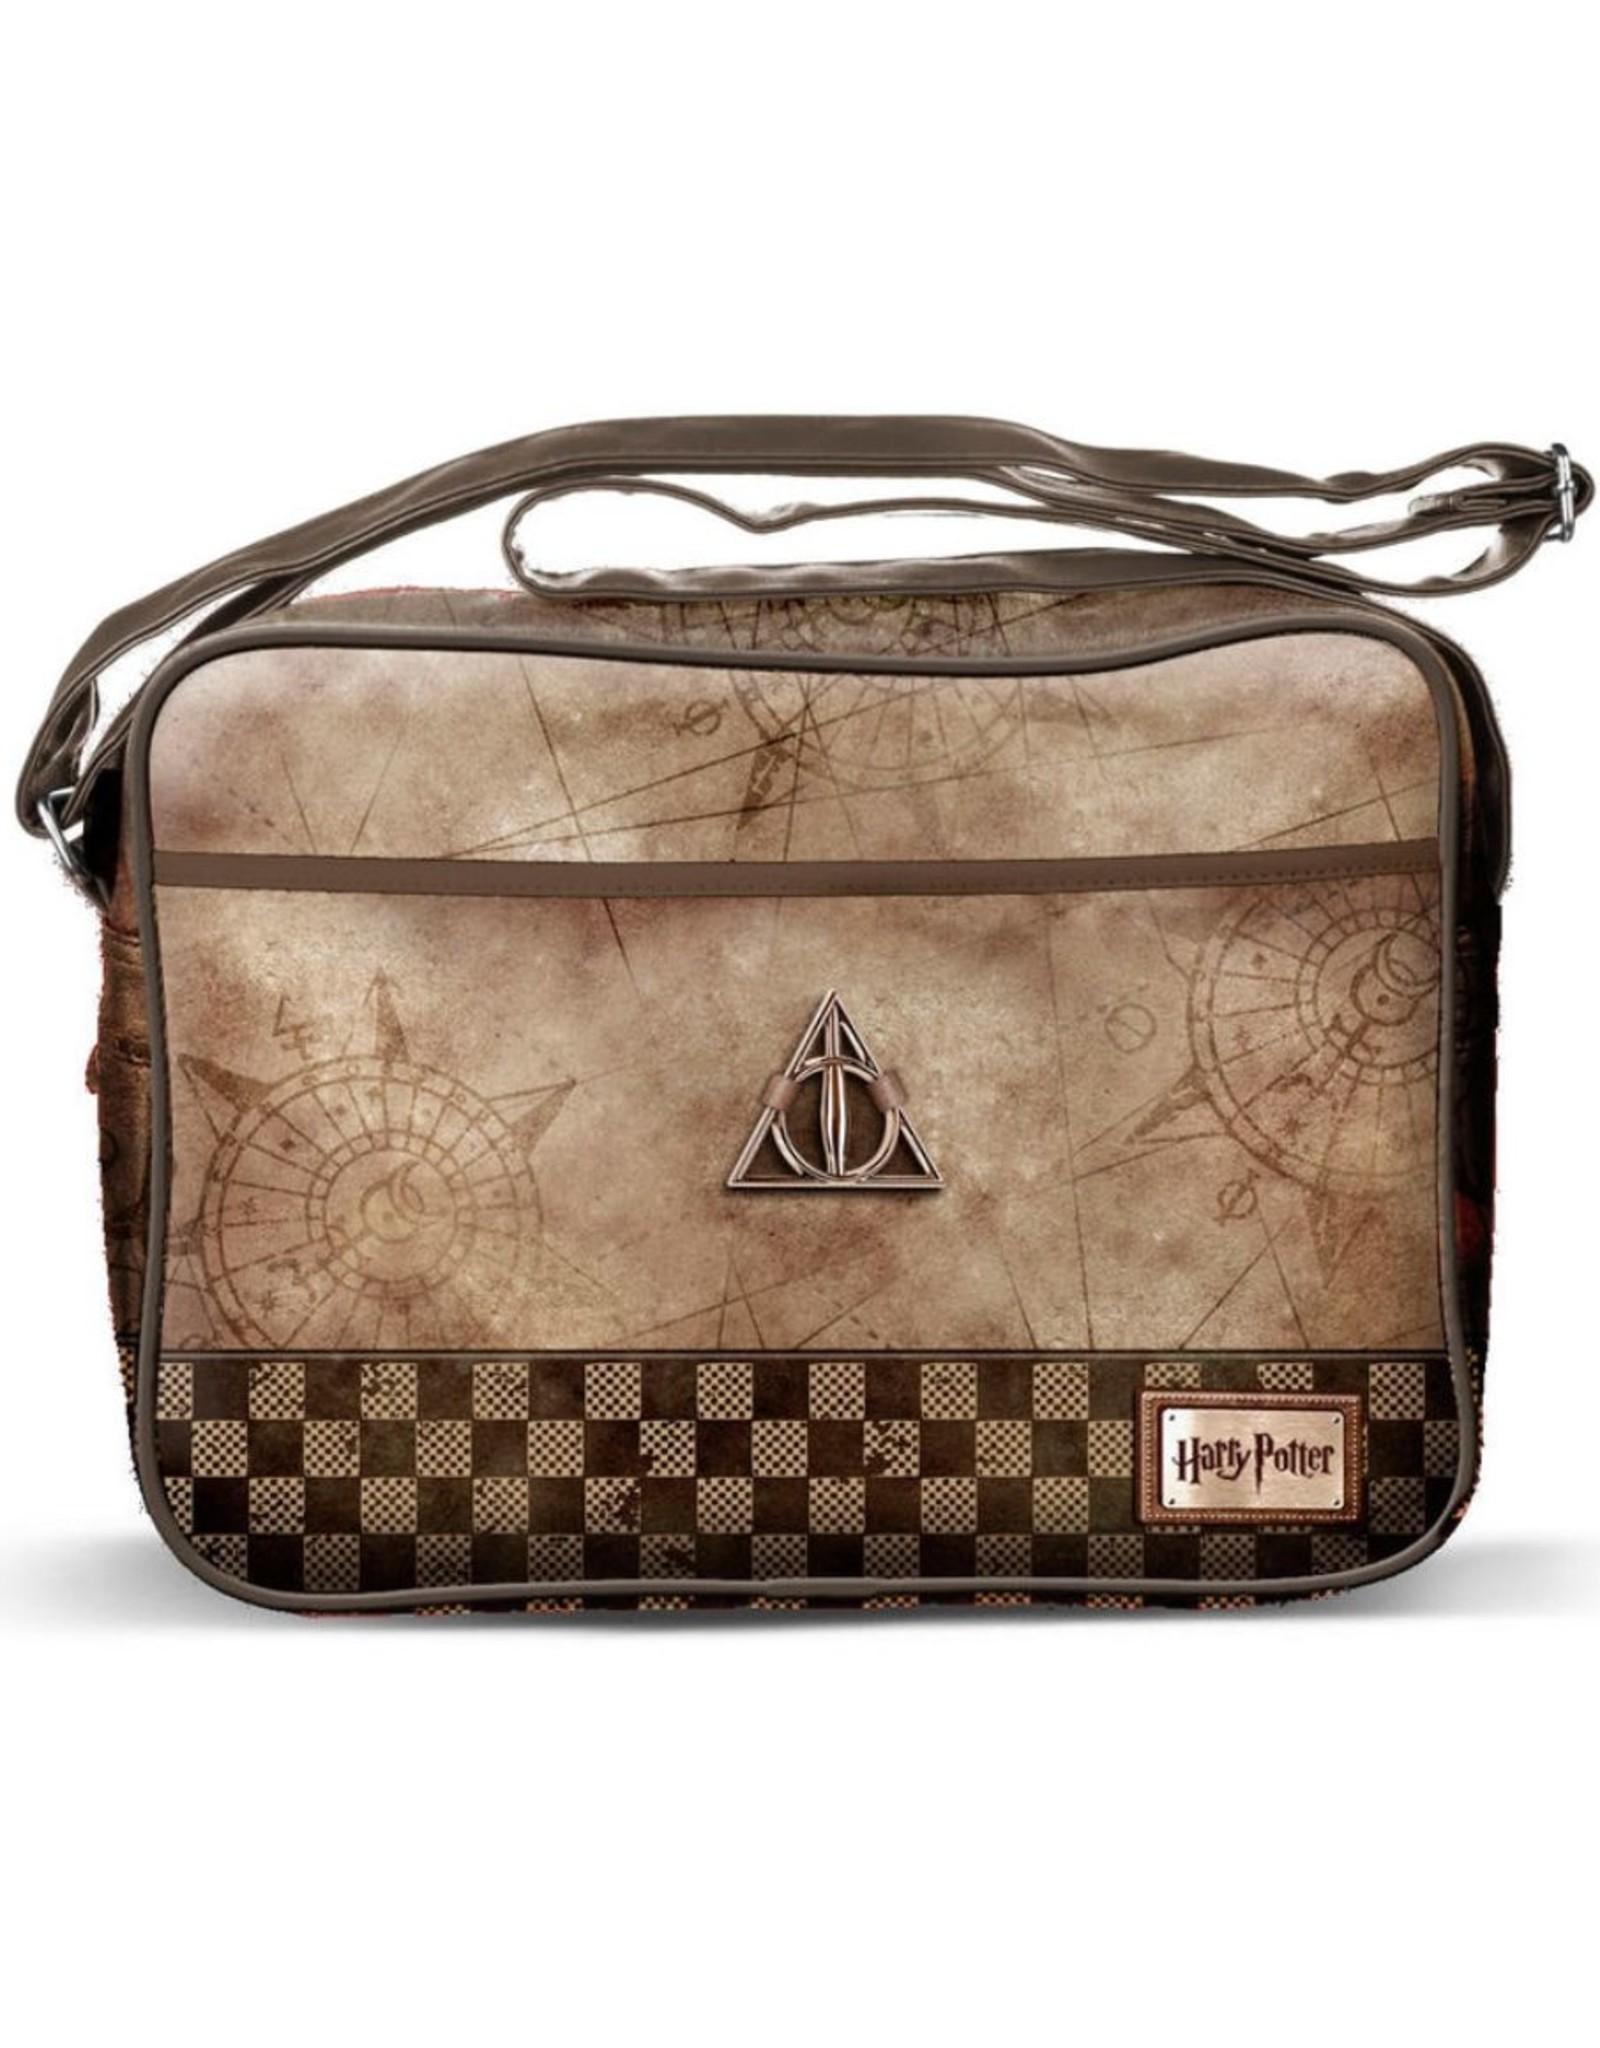 Karactermania Merchandise bags - Harry Potter The Deathly Hallows messenger bag